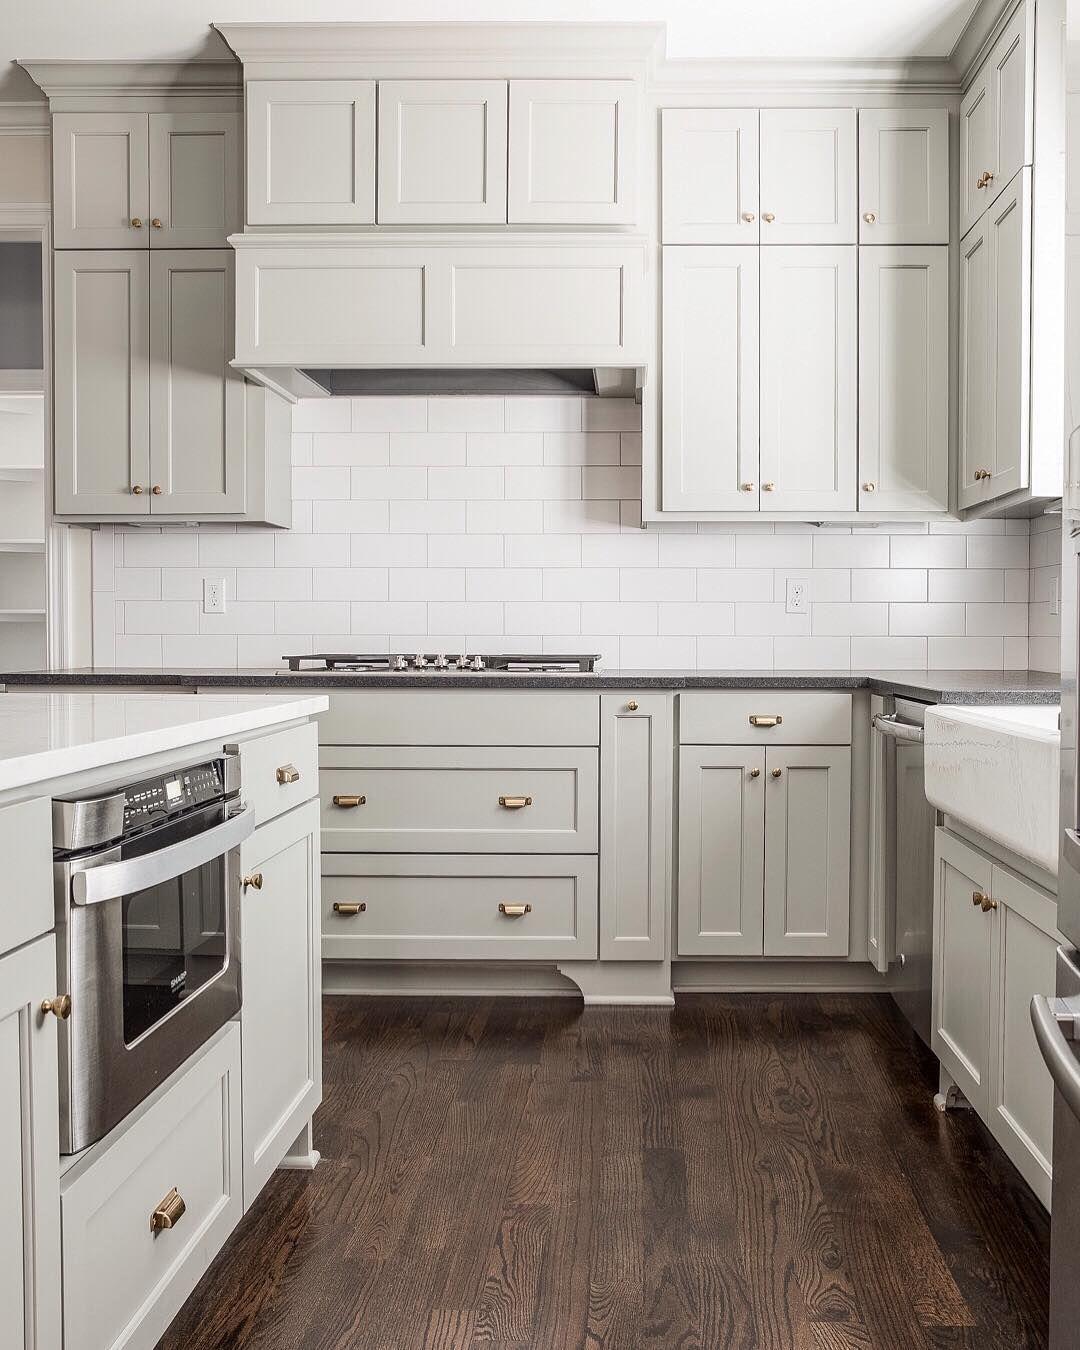 Rebuilding An 1890 Farmhouse Nallfarmhouse Instagram Photos And Videos Interior Styling Kitchen Design Kitchen Vent